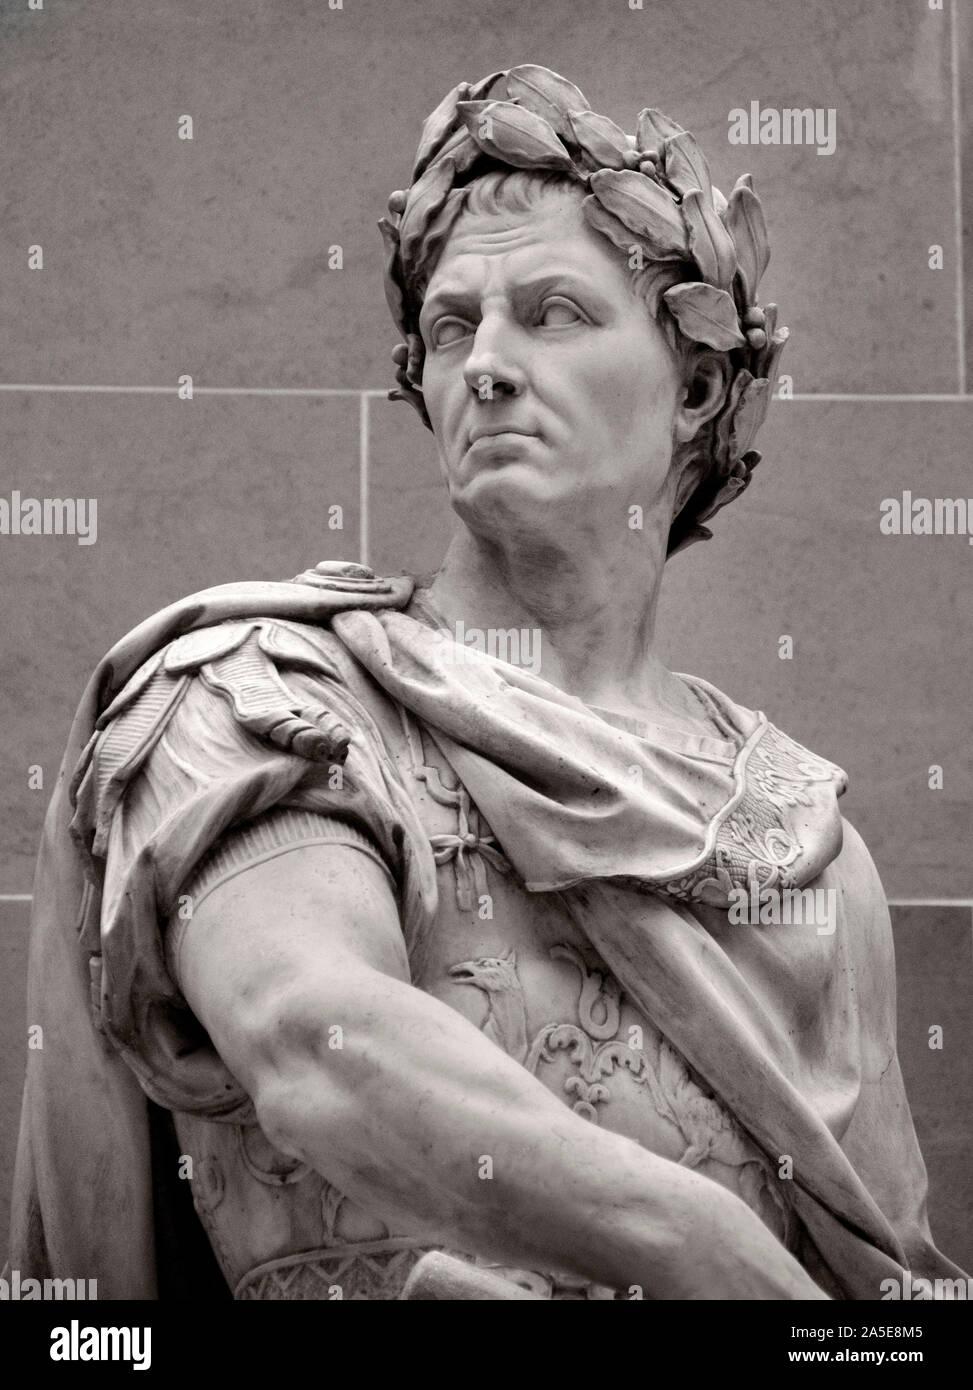 Gaius Julius Caesar 100 – 44 BC Roman emperor general statesman ( Roman, Italy, ) by Nicolas Coustou 1658–1733 Baroque France, Stock Photo